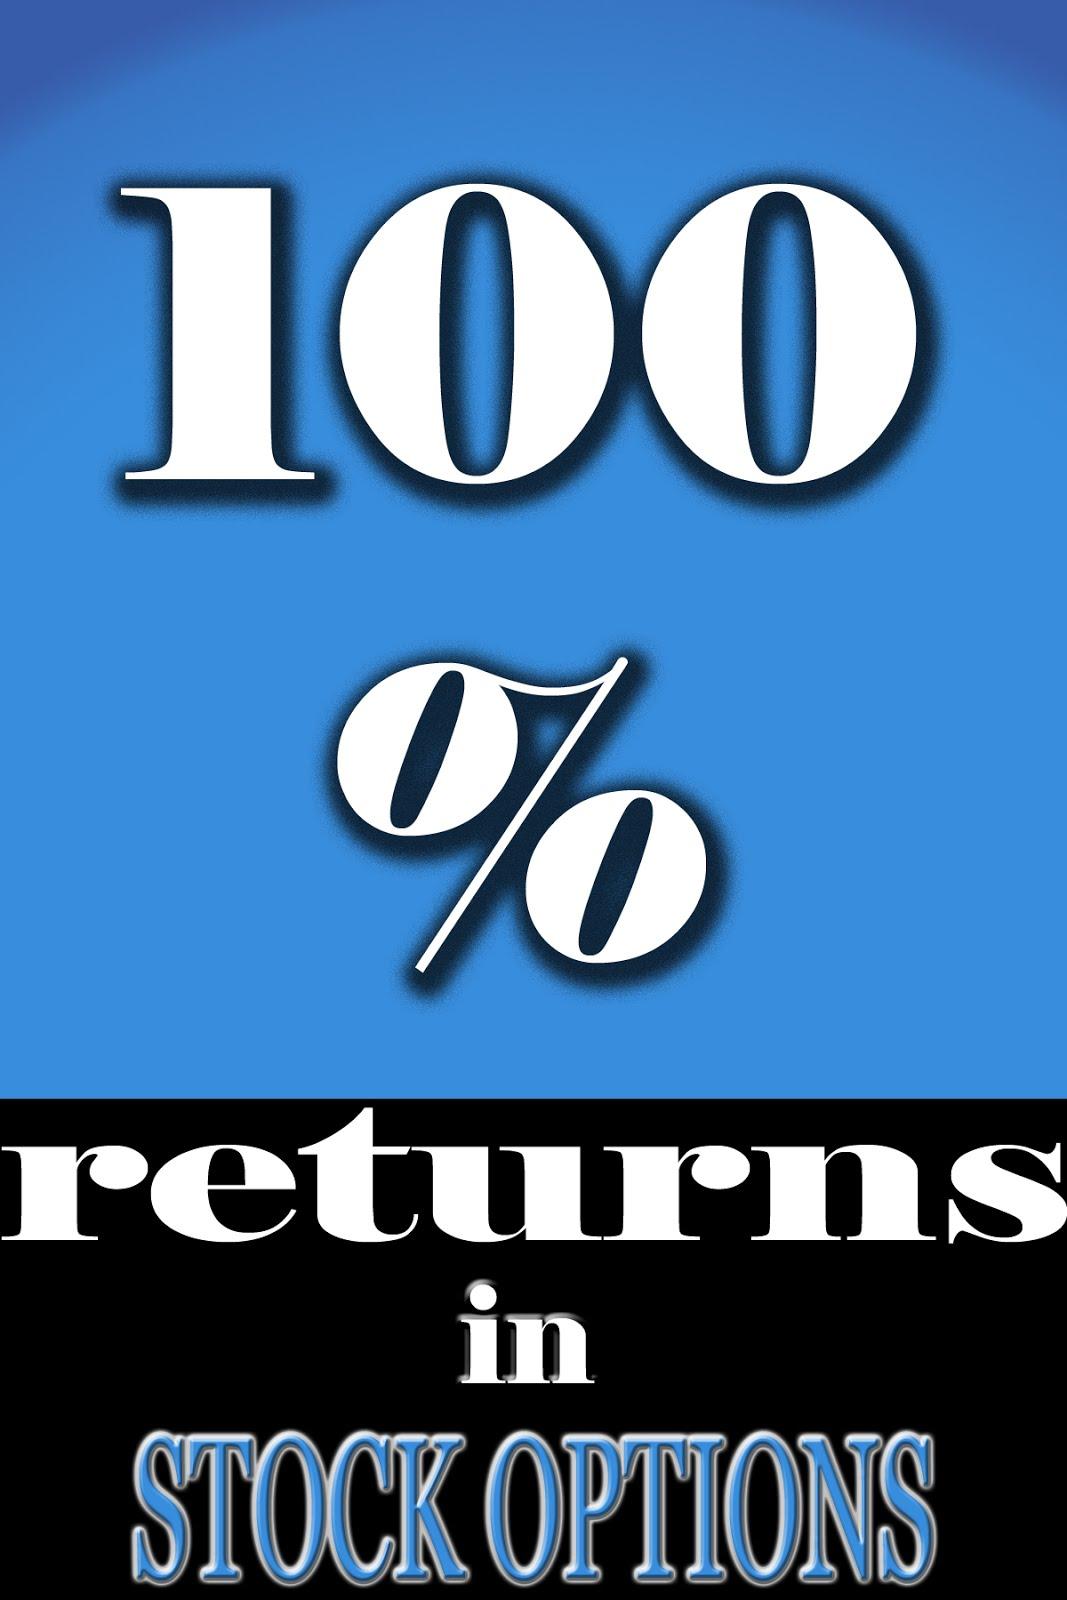 Stock options returns